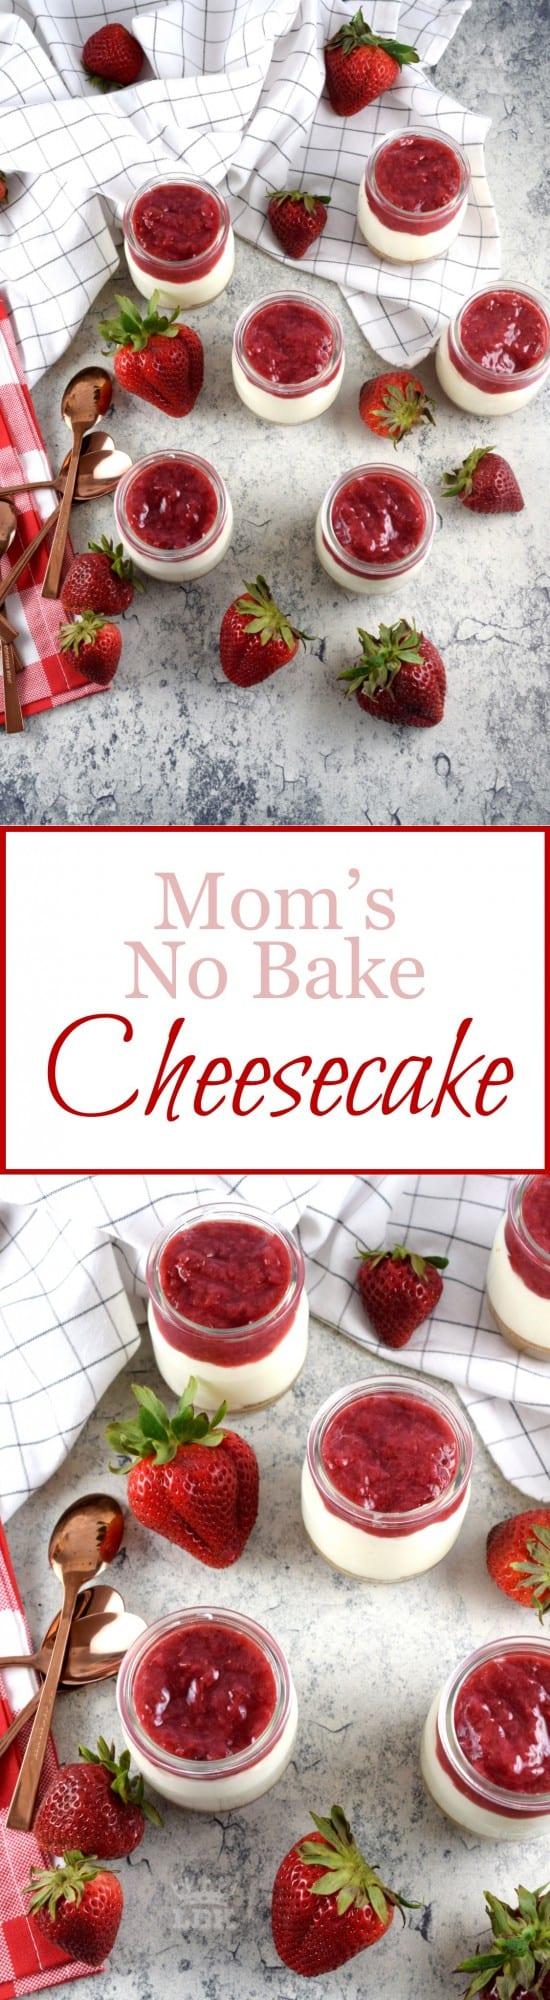 Mom's No Bake Cheesecake